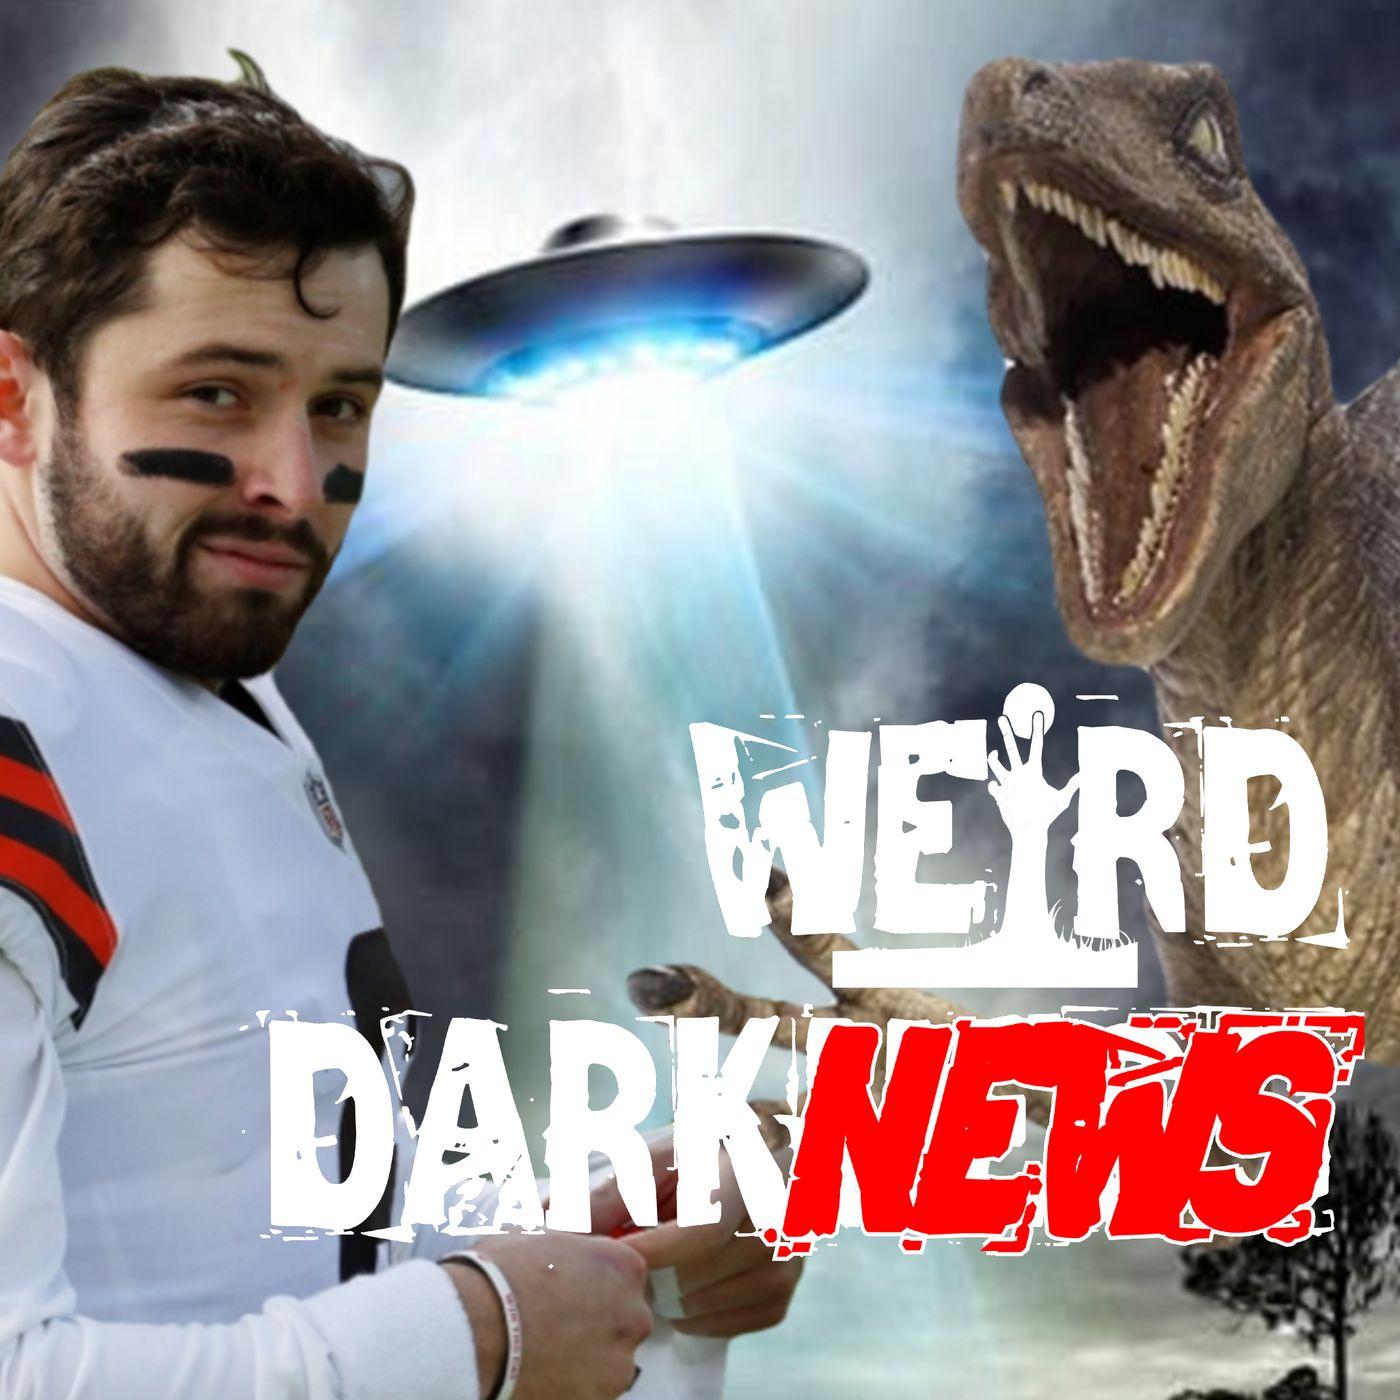 """NFL PLAYER SAYS 'I BELIEVE'"", ""DINO ON SECURITY CAM"", and more Weird DarkNews!  #WeirdDarkness"